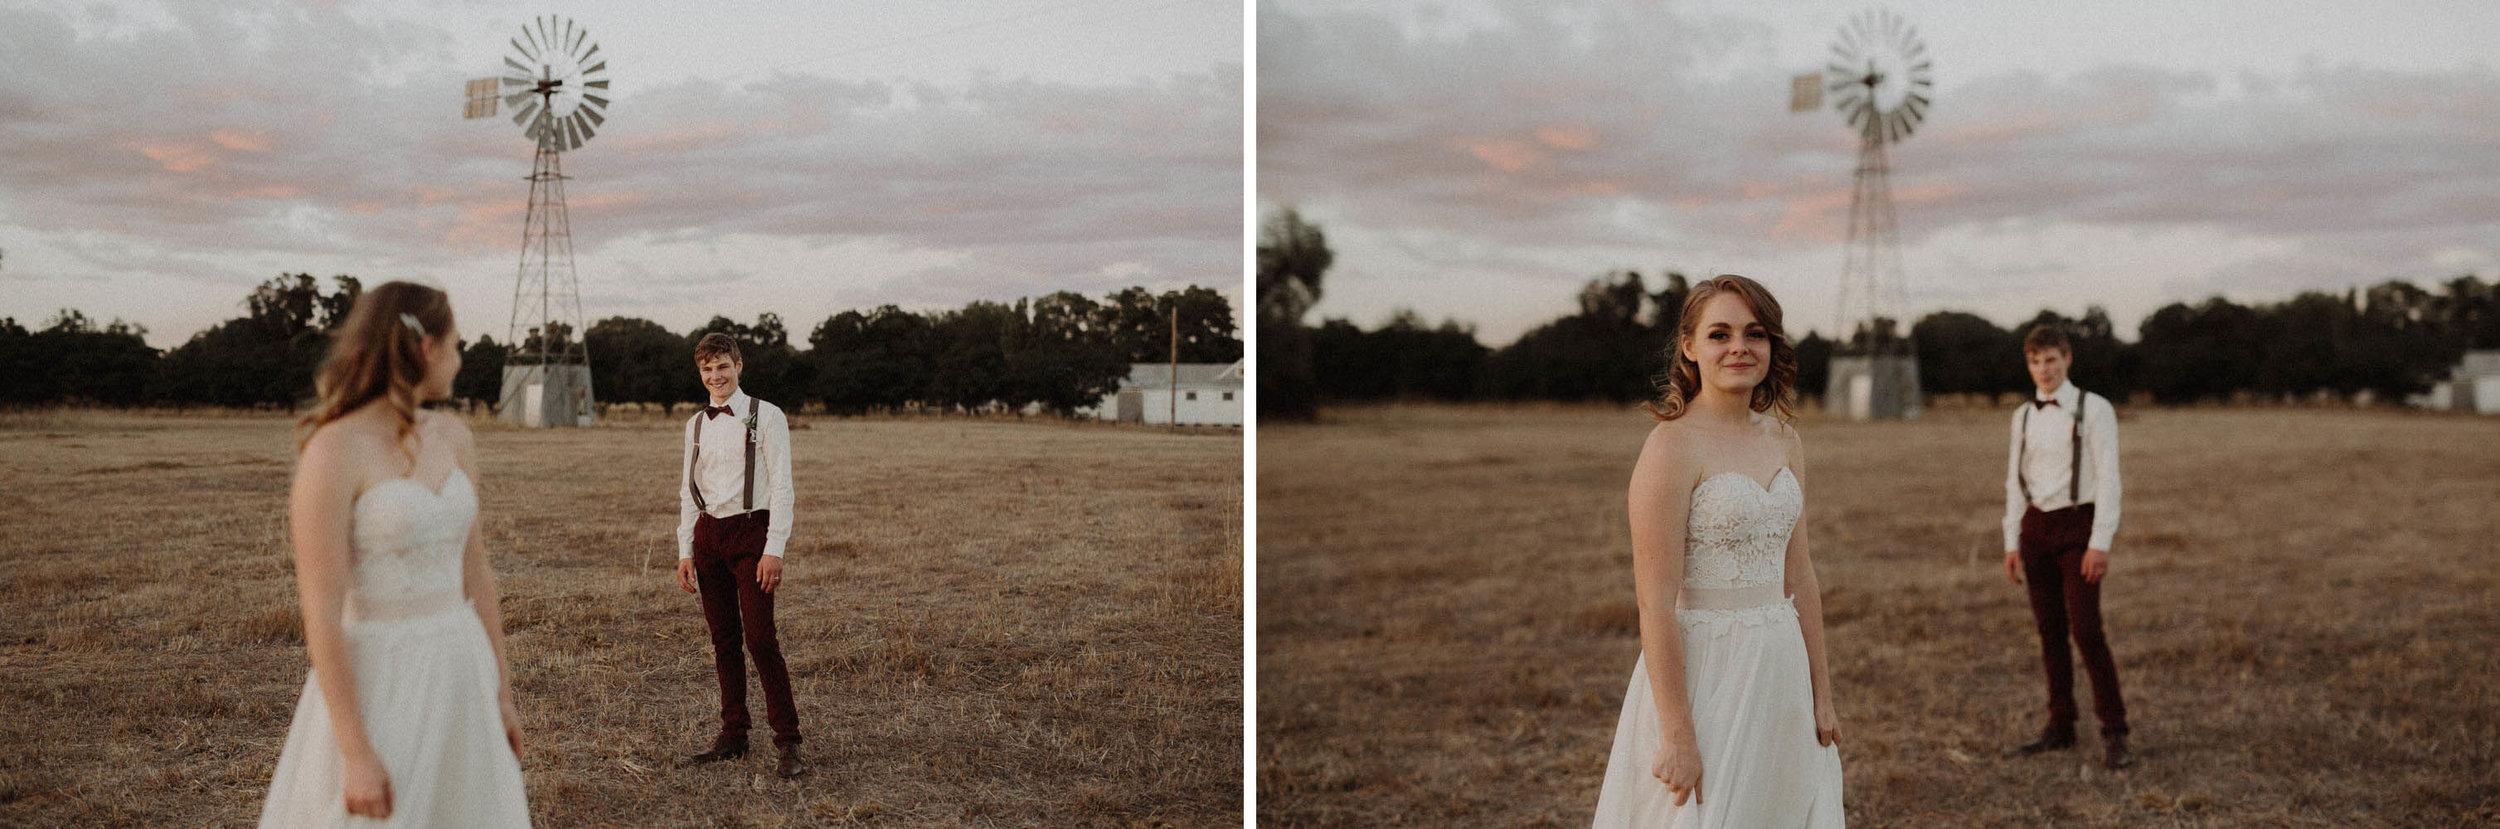 australian-wedding-photography_204(3947)2.jpg